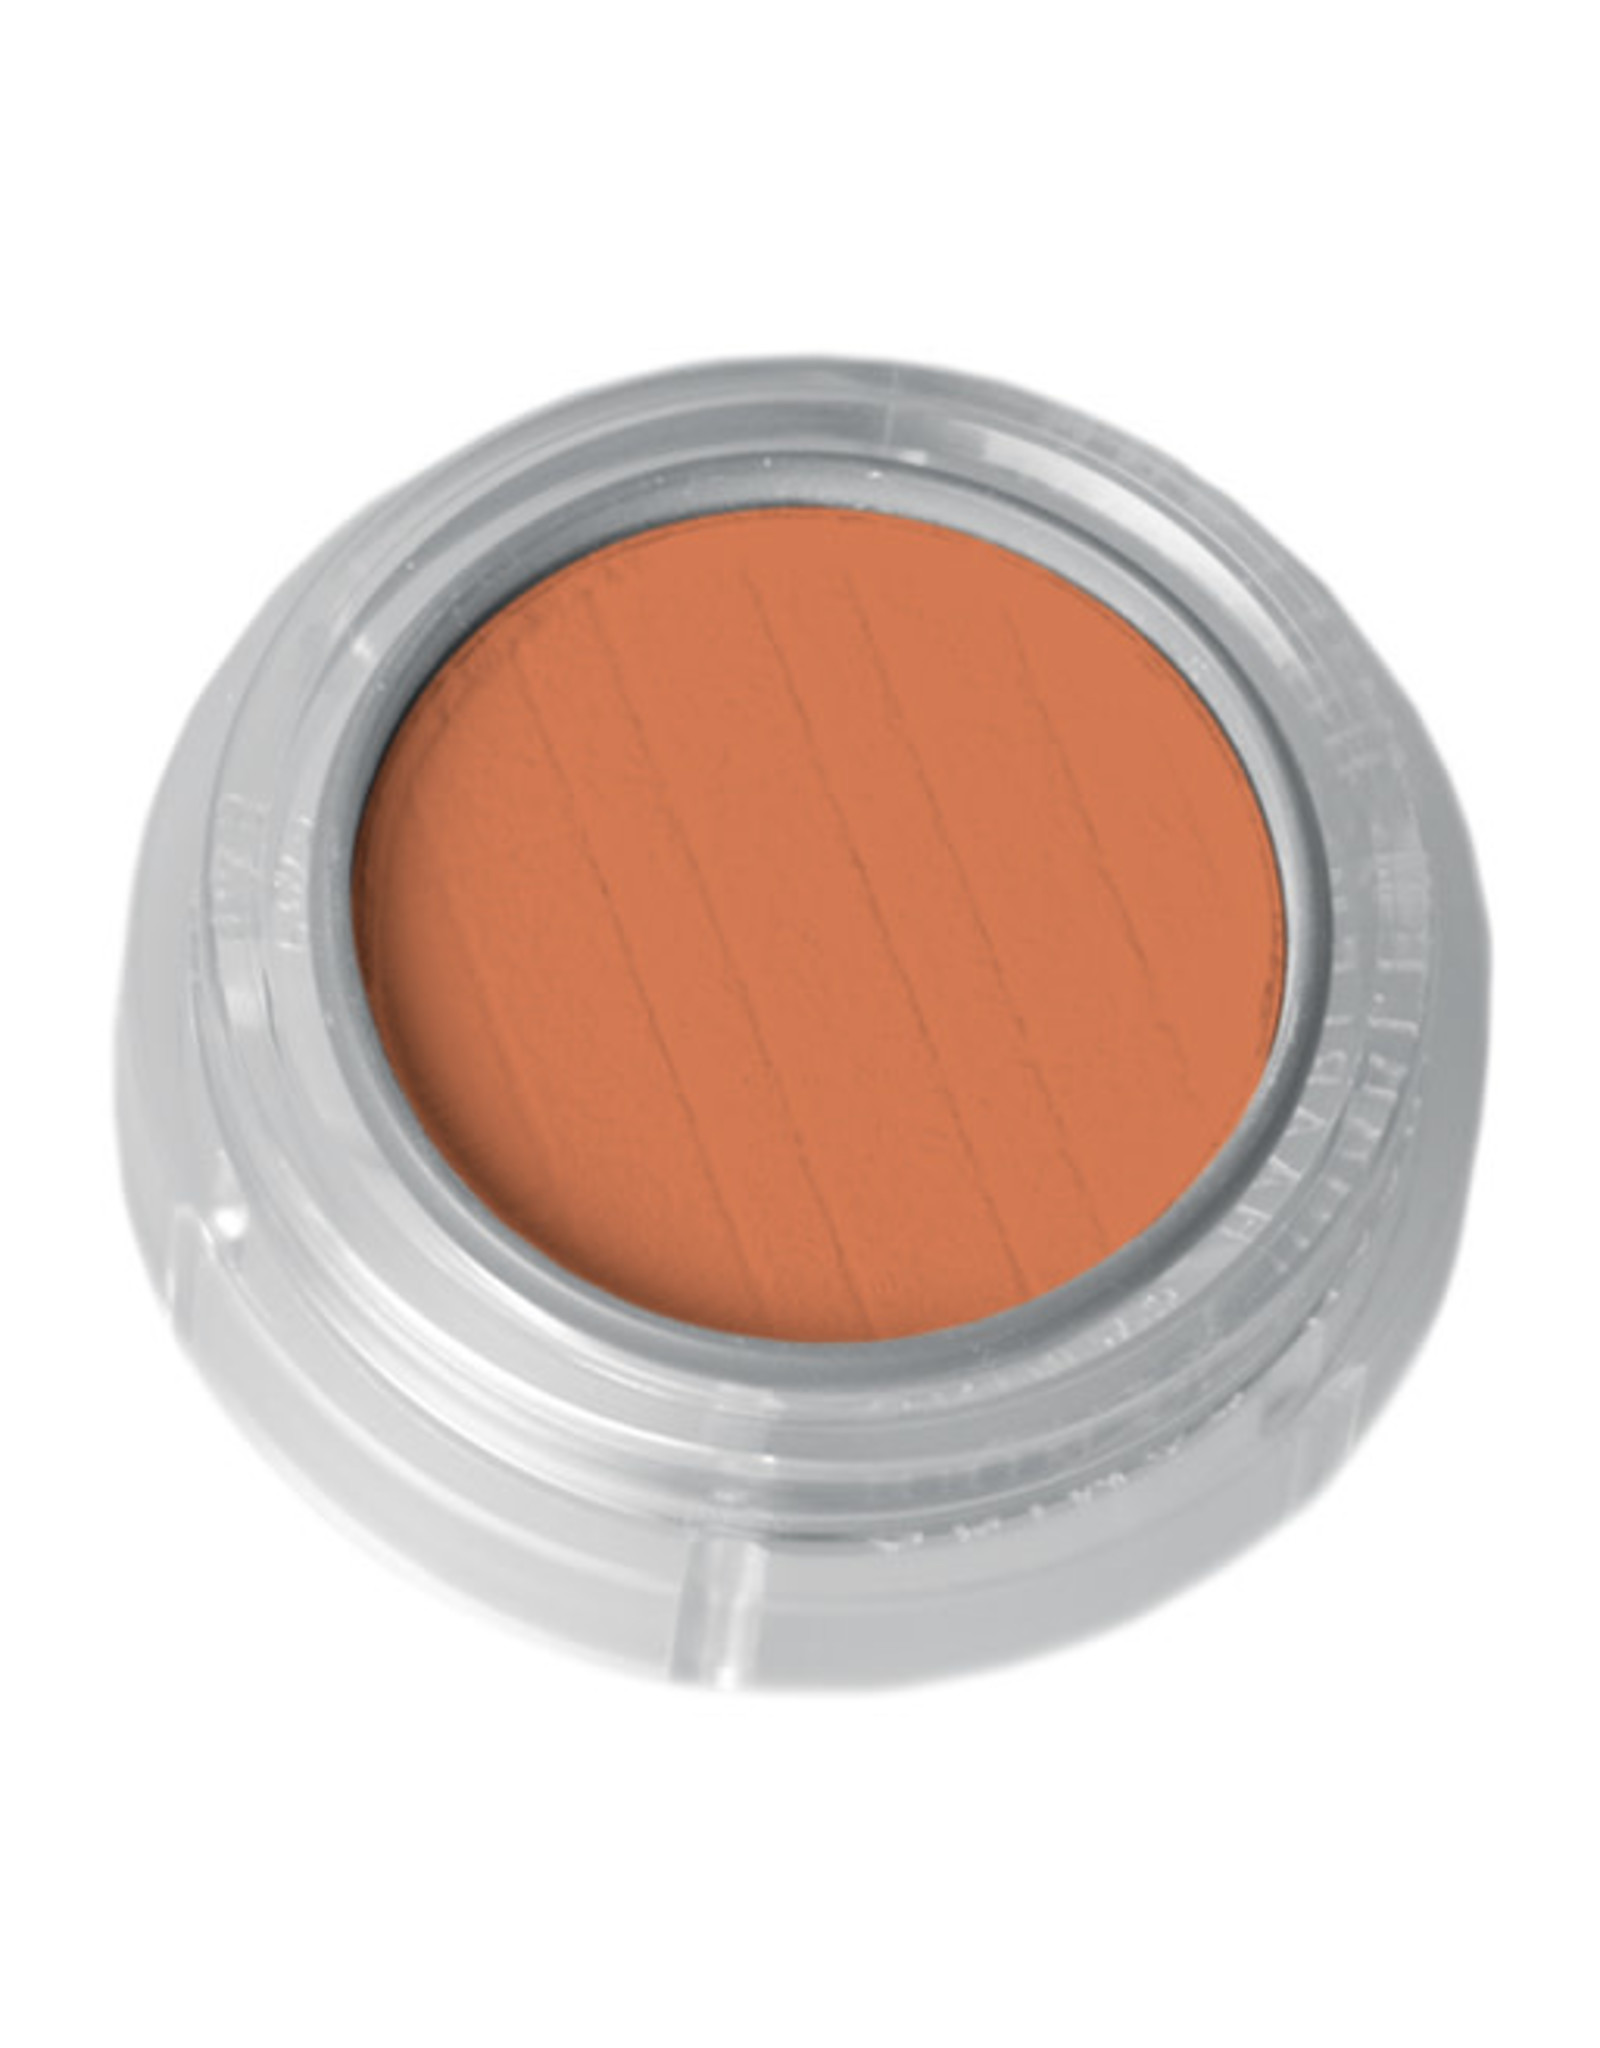 Grimas EYESHADOW/ROUGE 553 Oranje A1 (2 g)